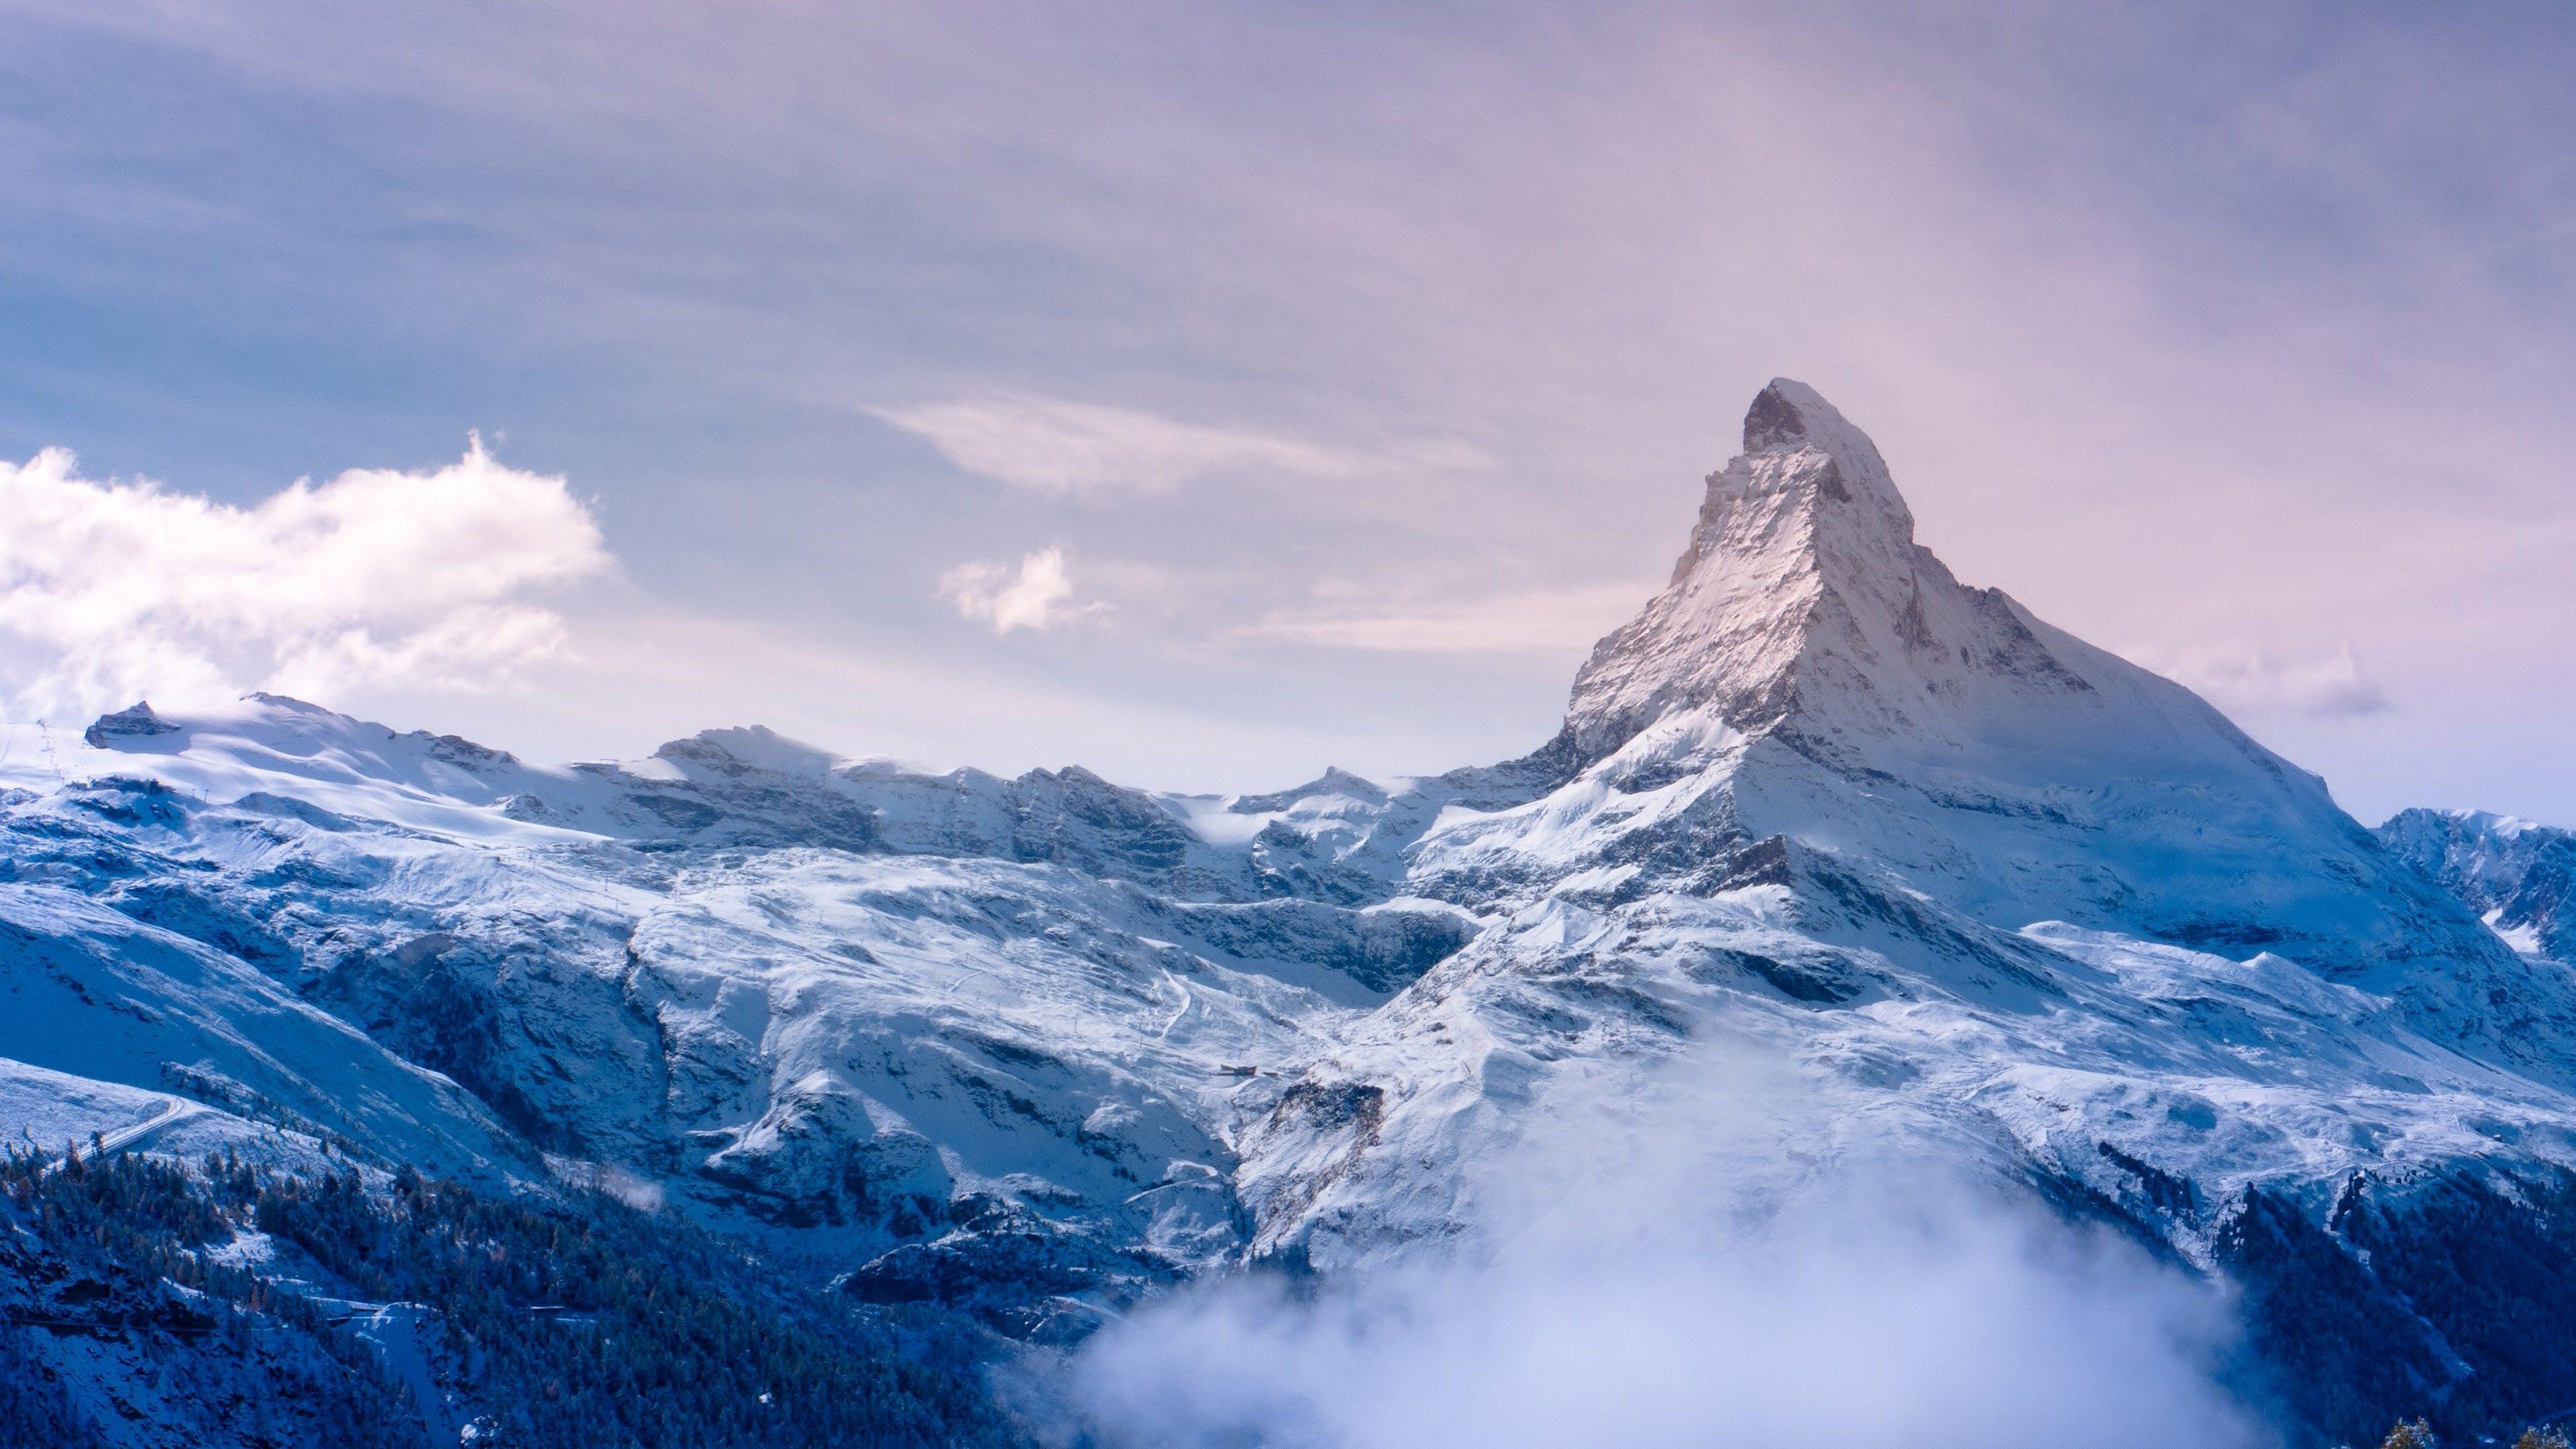 Mount Everest Nepal Zermatt 4k Hd Wallpaper Valais Switzerland Travel Tourism Resort Mountain In 2020 Mountain Wallpaper Mountain Pictures Winter Wallpaper Hd